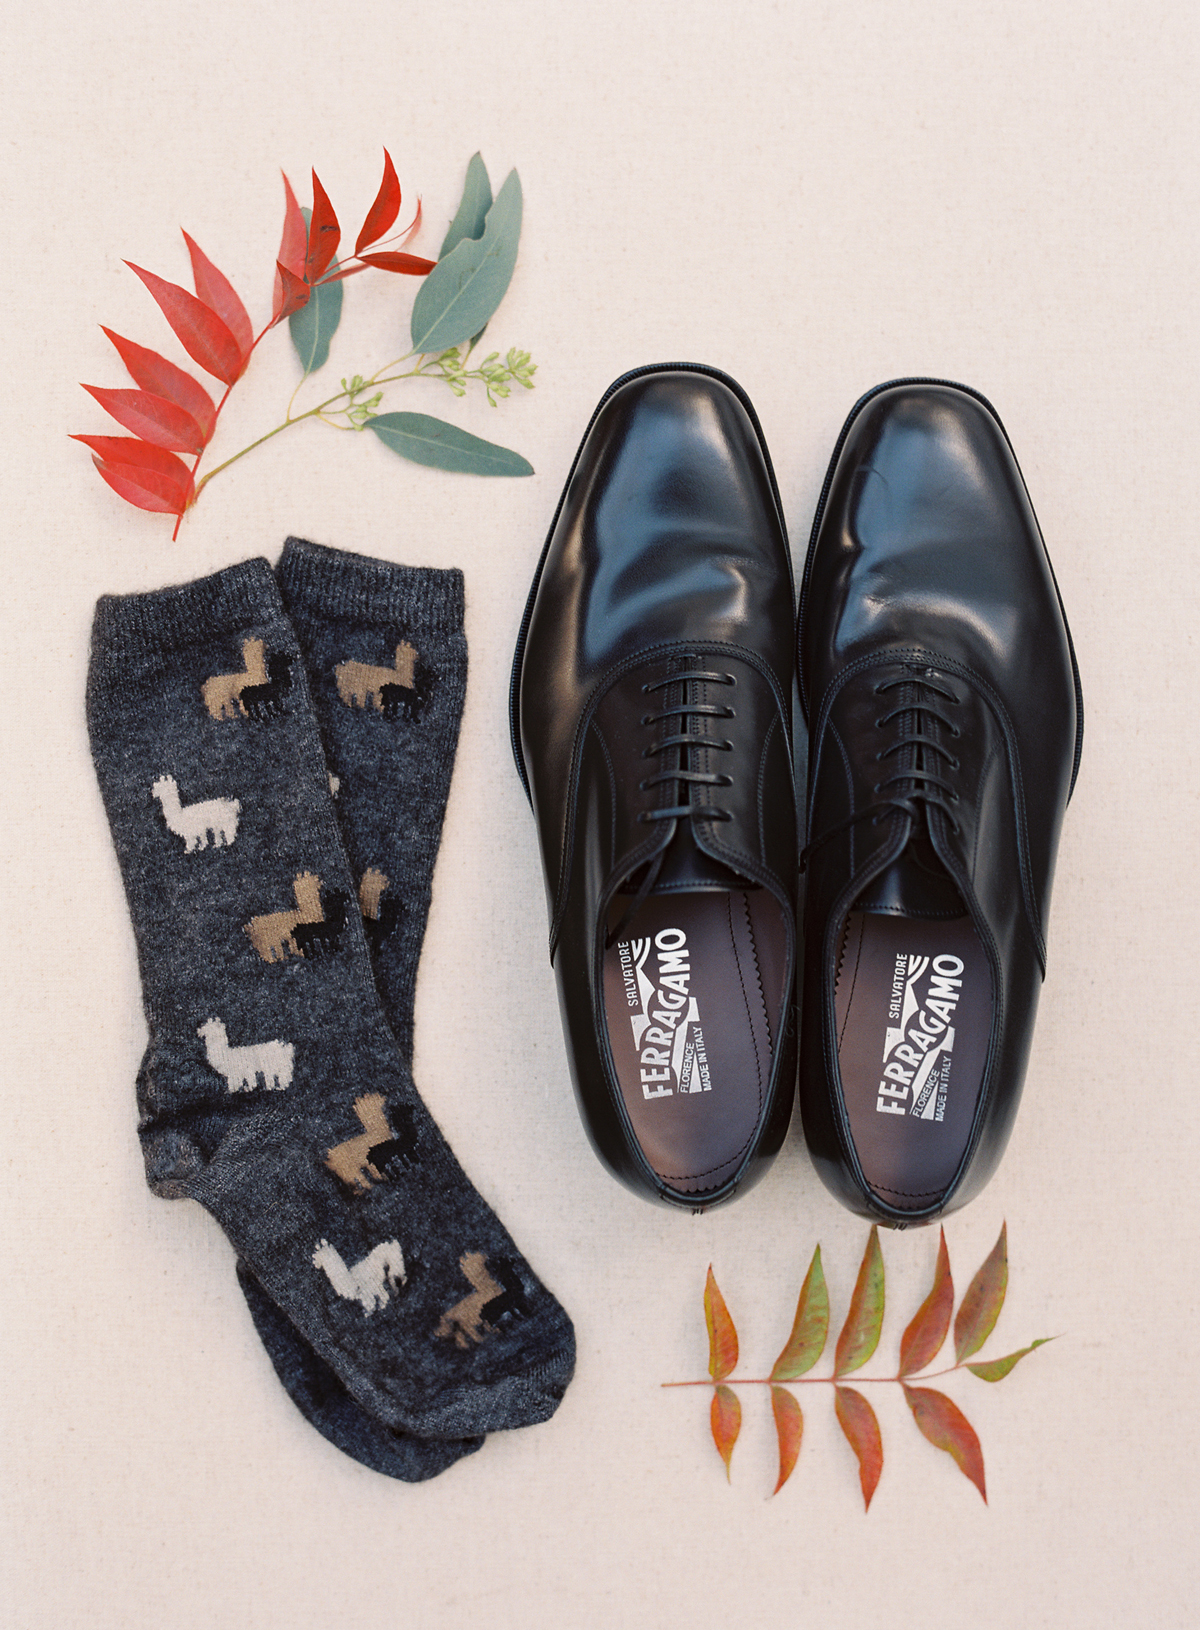 llama print socks and black dress shoes